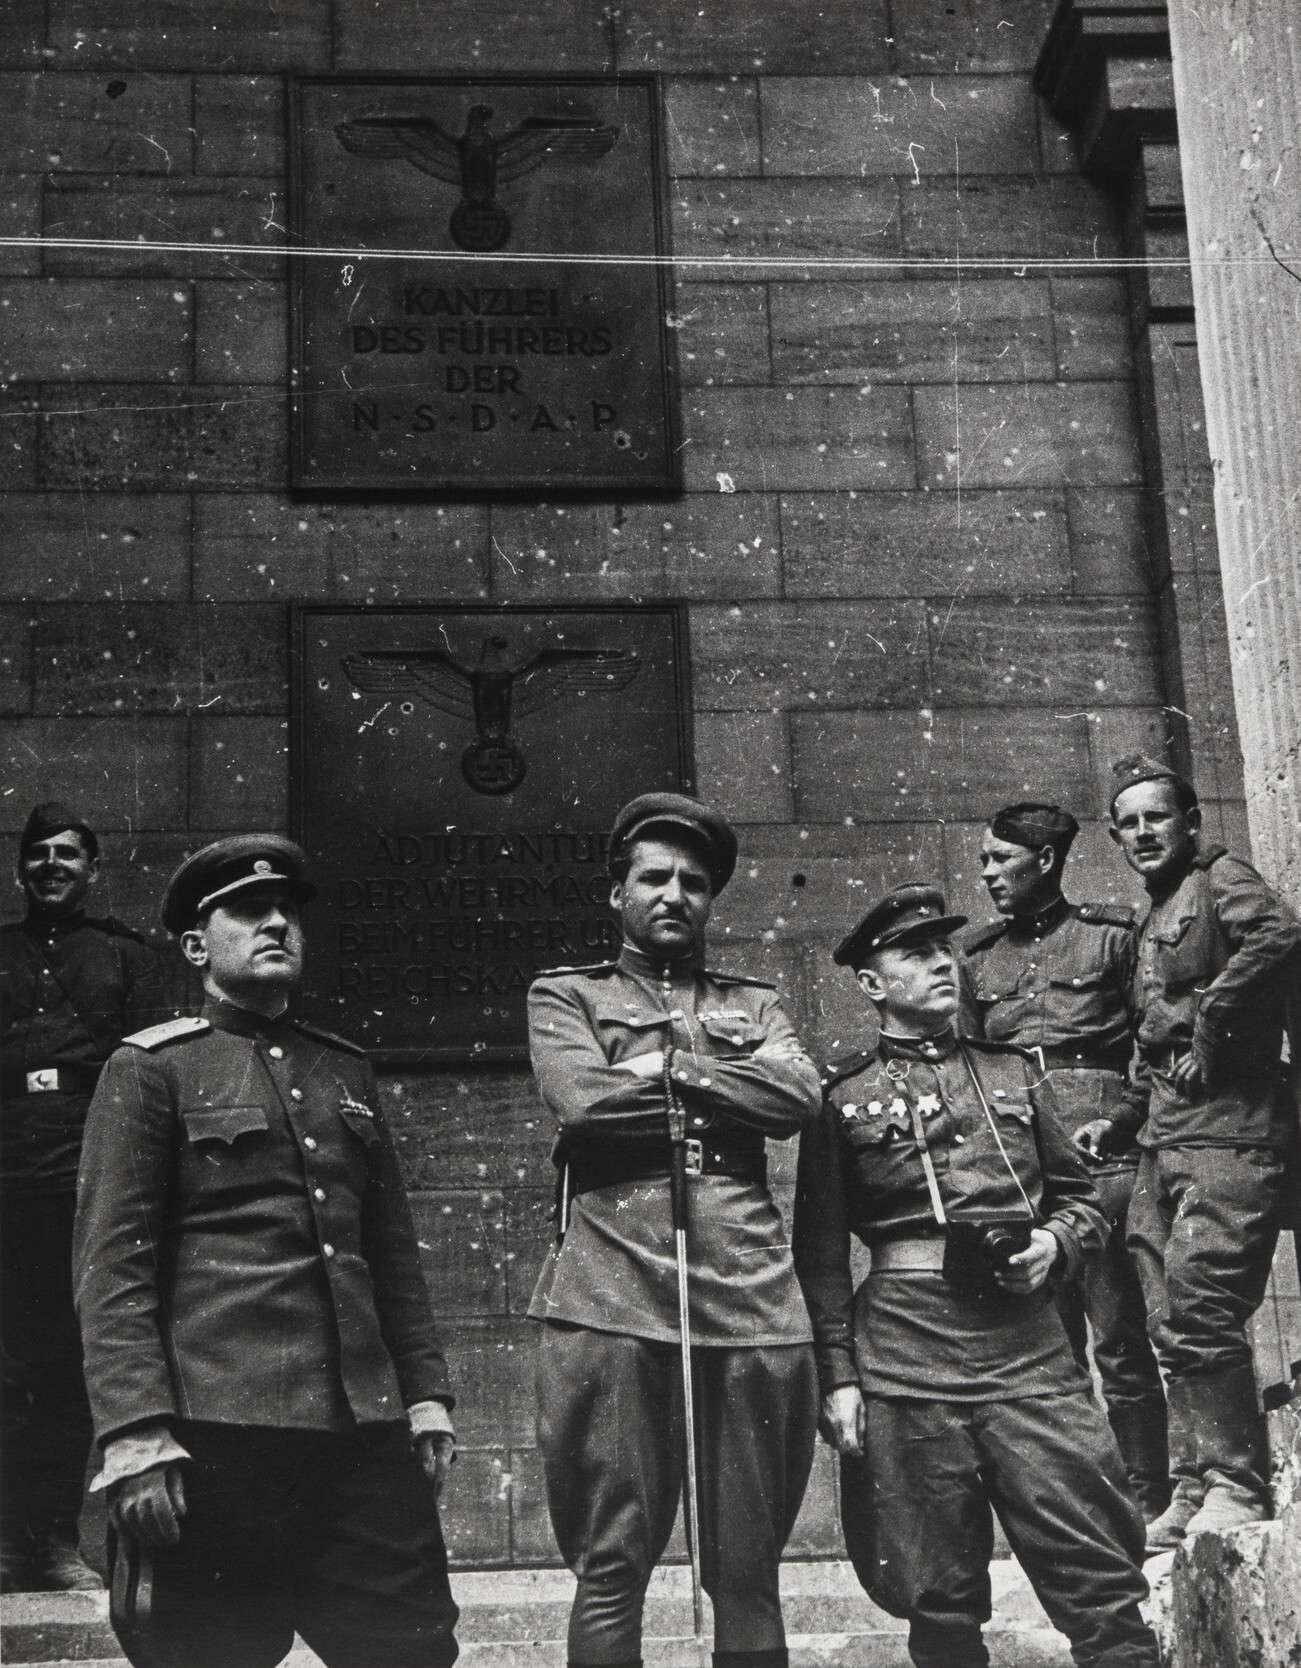 Евгений Халдей.    Константин Симонов на ступенях рейхсканцелярии   Германия,Берлин,1945